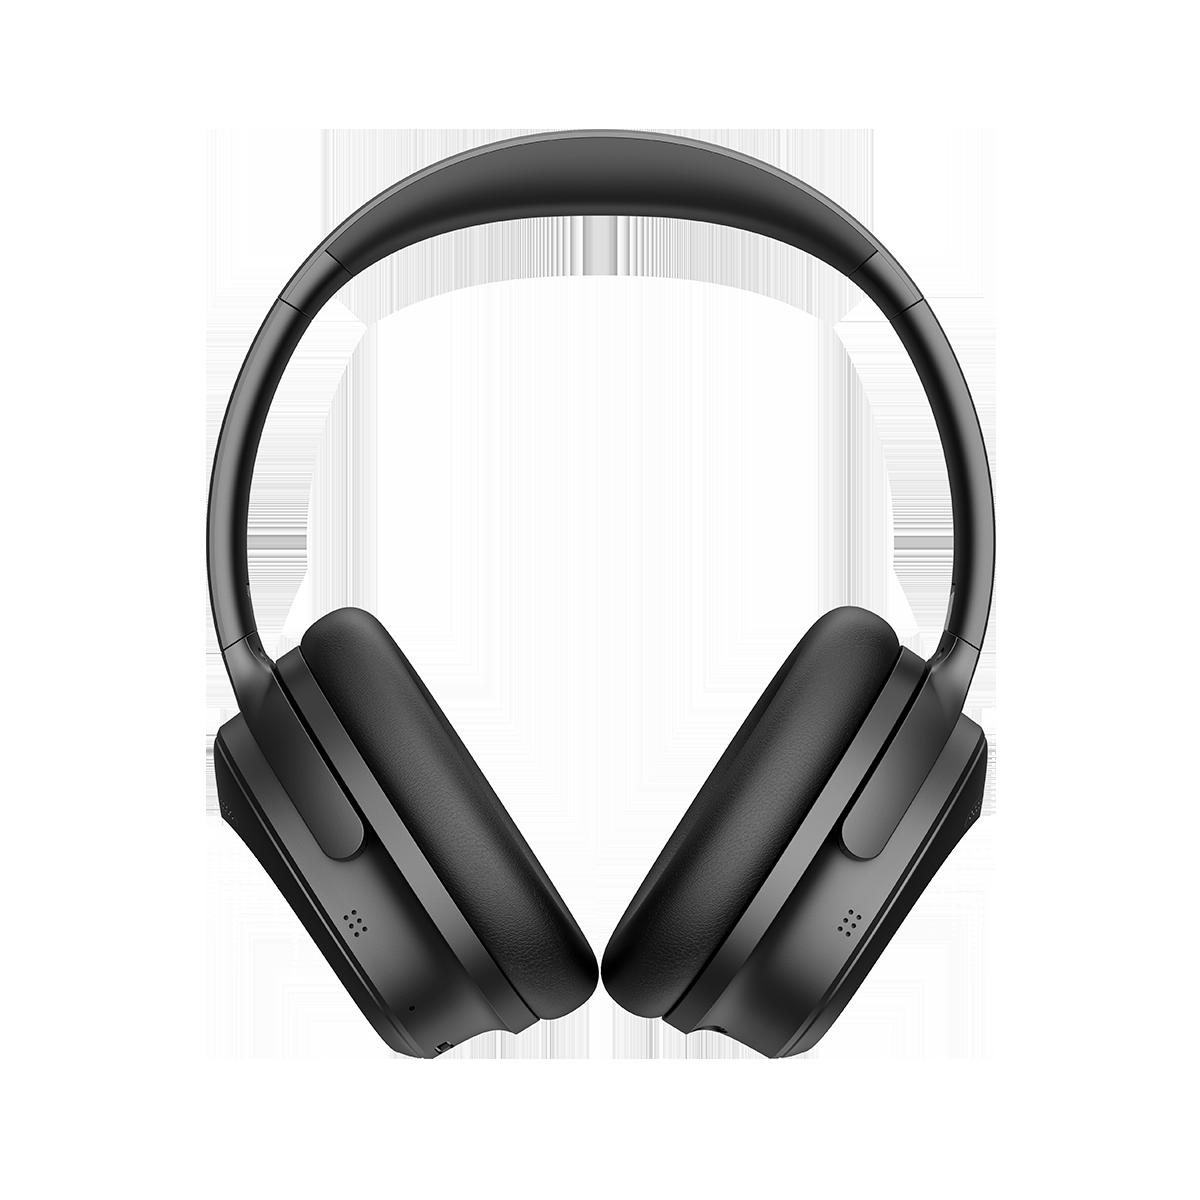 Ausounds Noise Cancellation Headphone